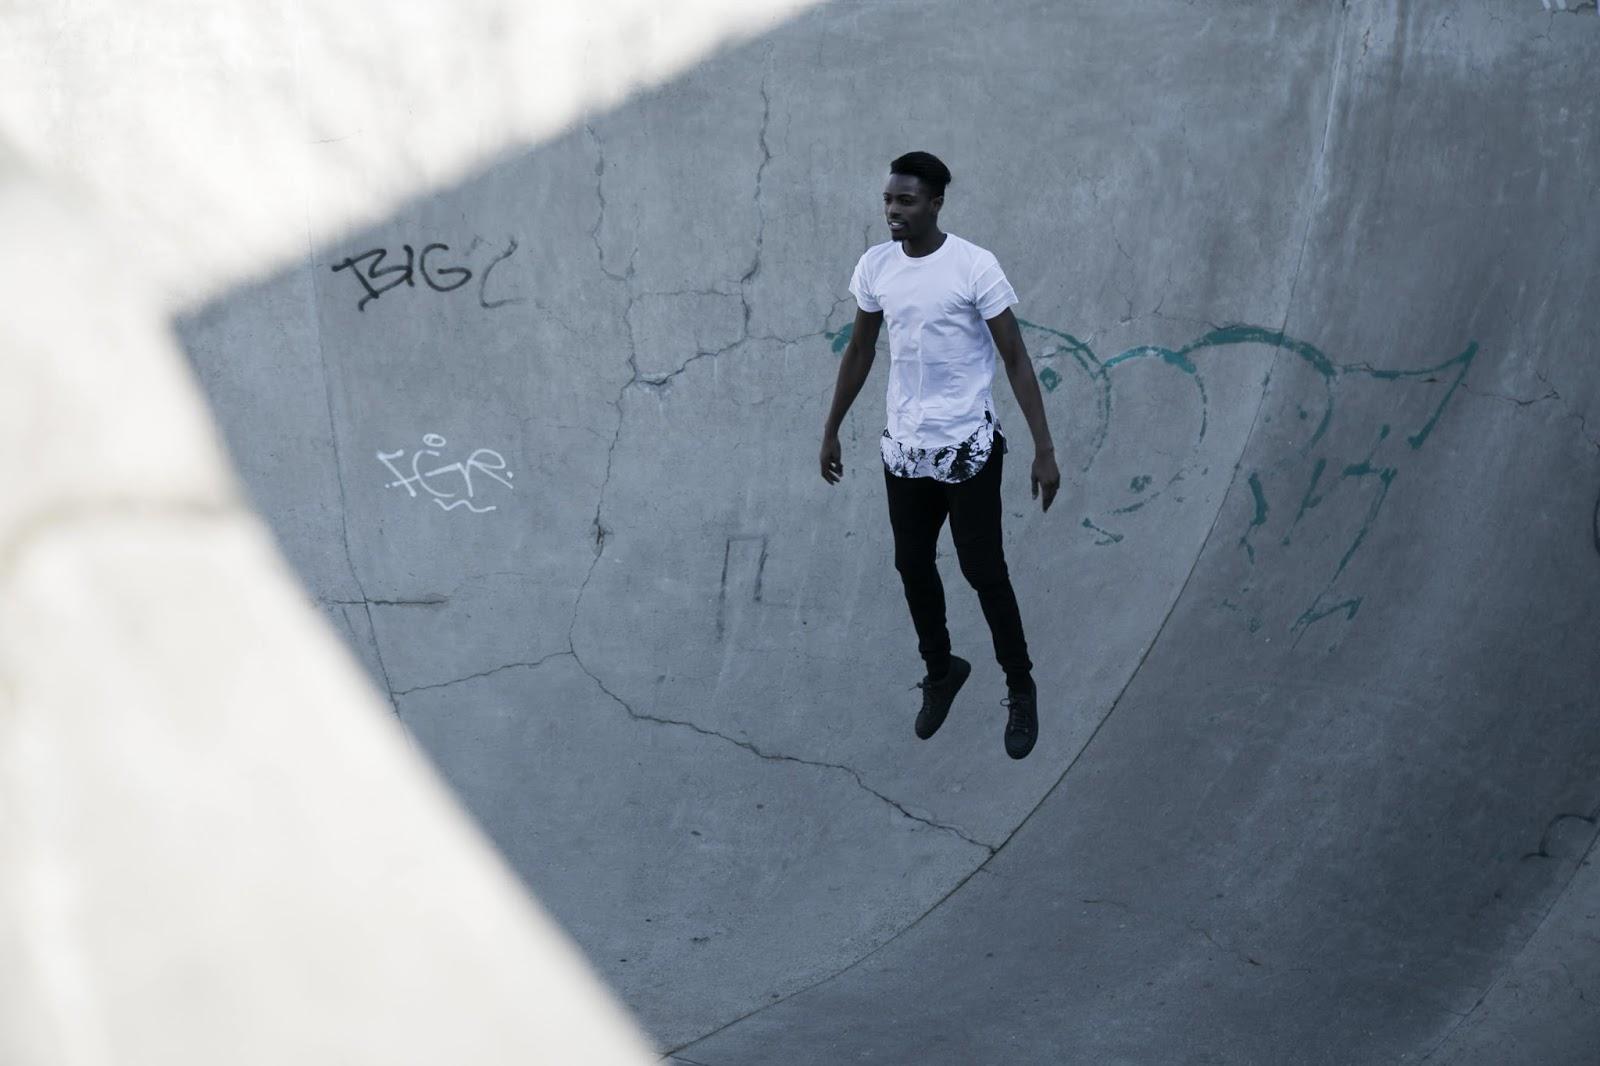 levitation black and white marble tshirt lookbook urban flavours foh apparel biker jogger etq sneakers freyrs sunglasses antwerp skateparc mensfashion blogger